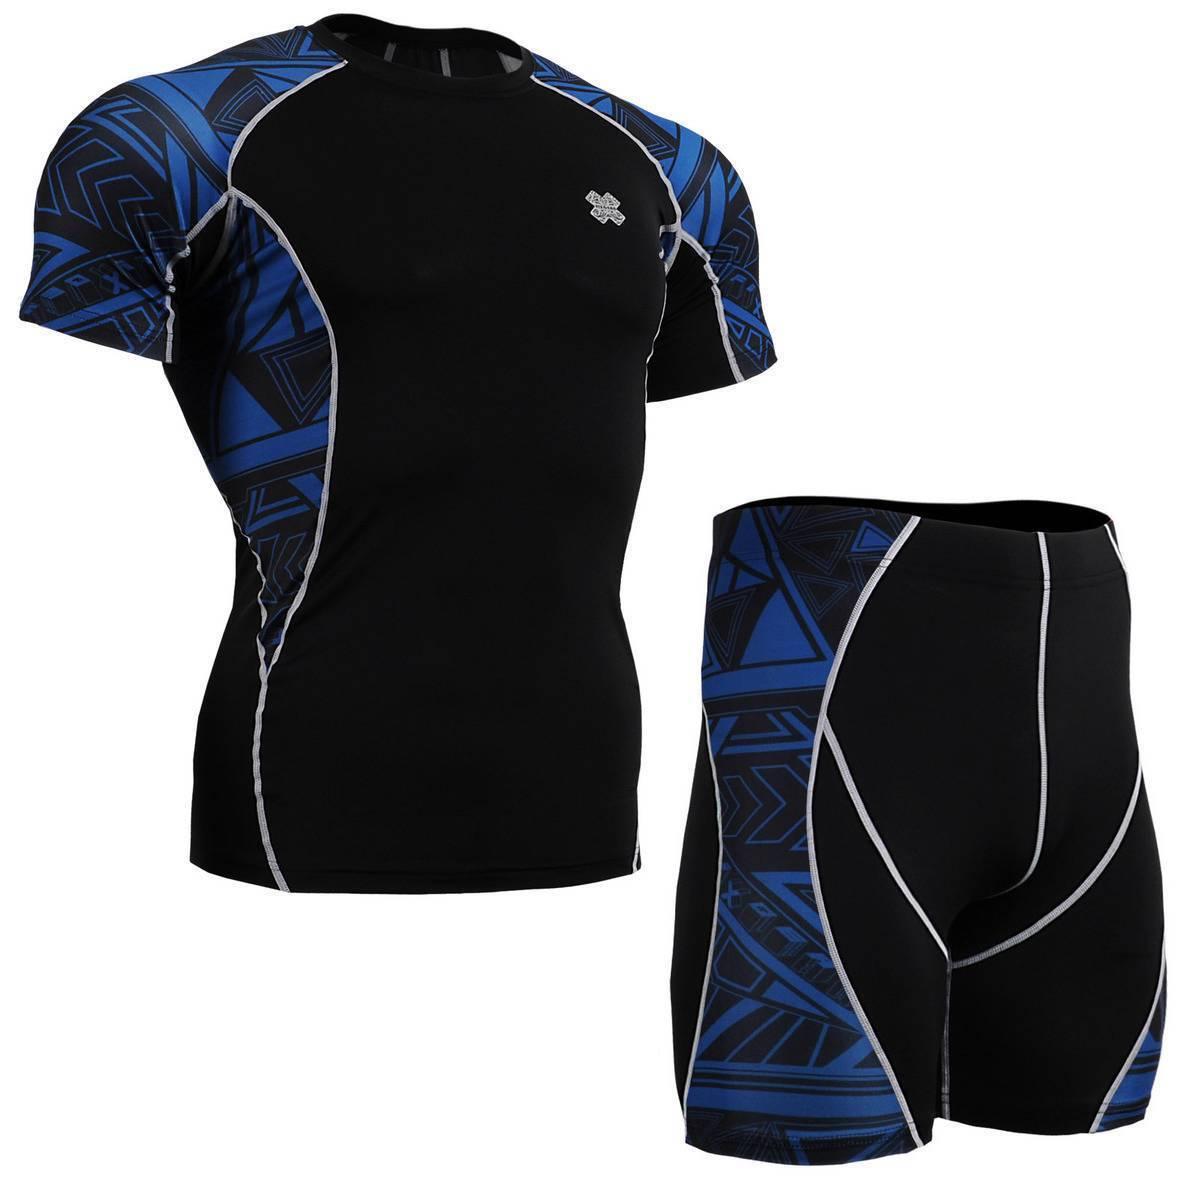 FIXGEAR C2S P2S-B1 SET Compression Shirt & Shorts Skin-tight MMA Base Layer